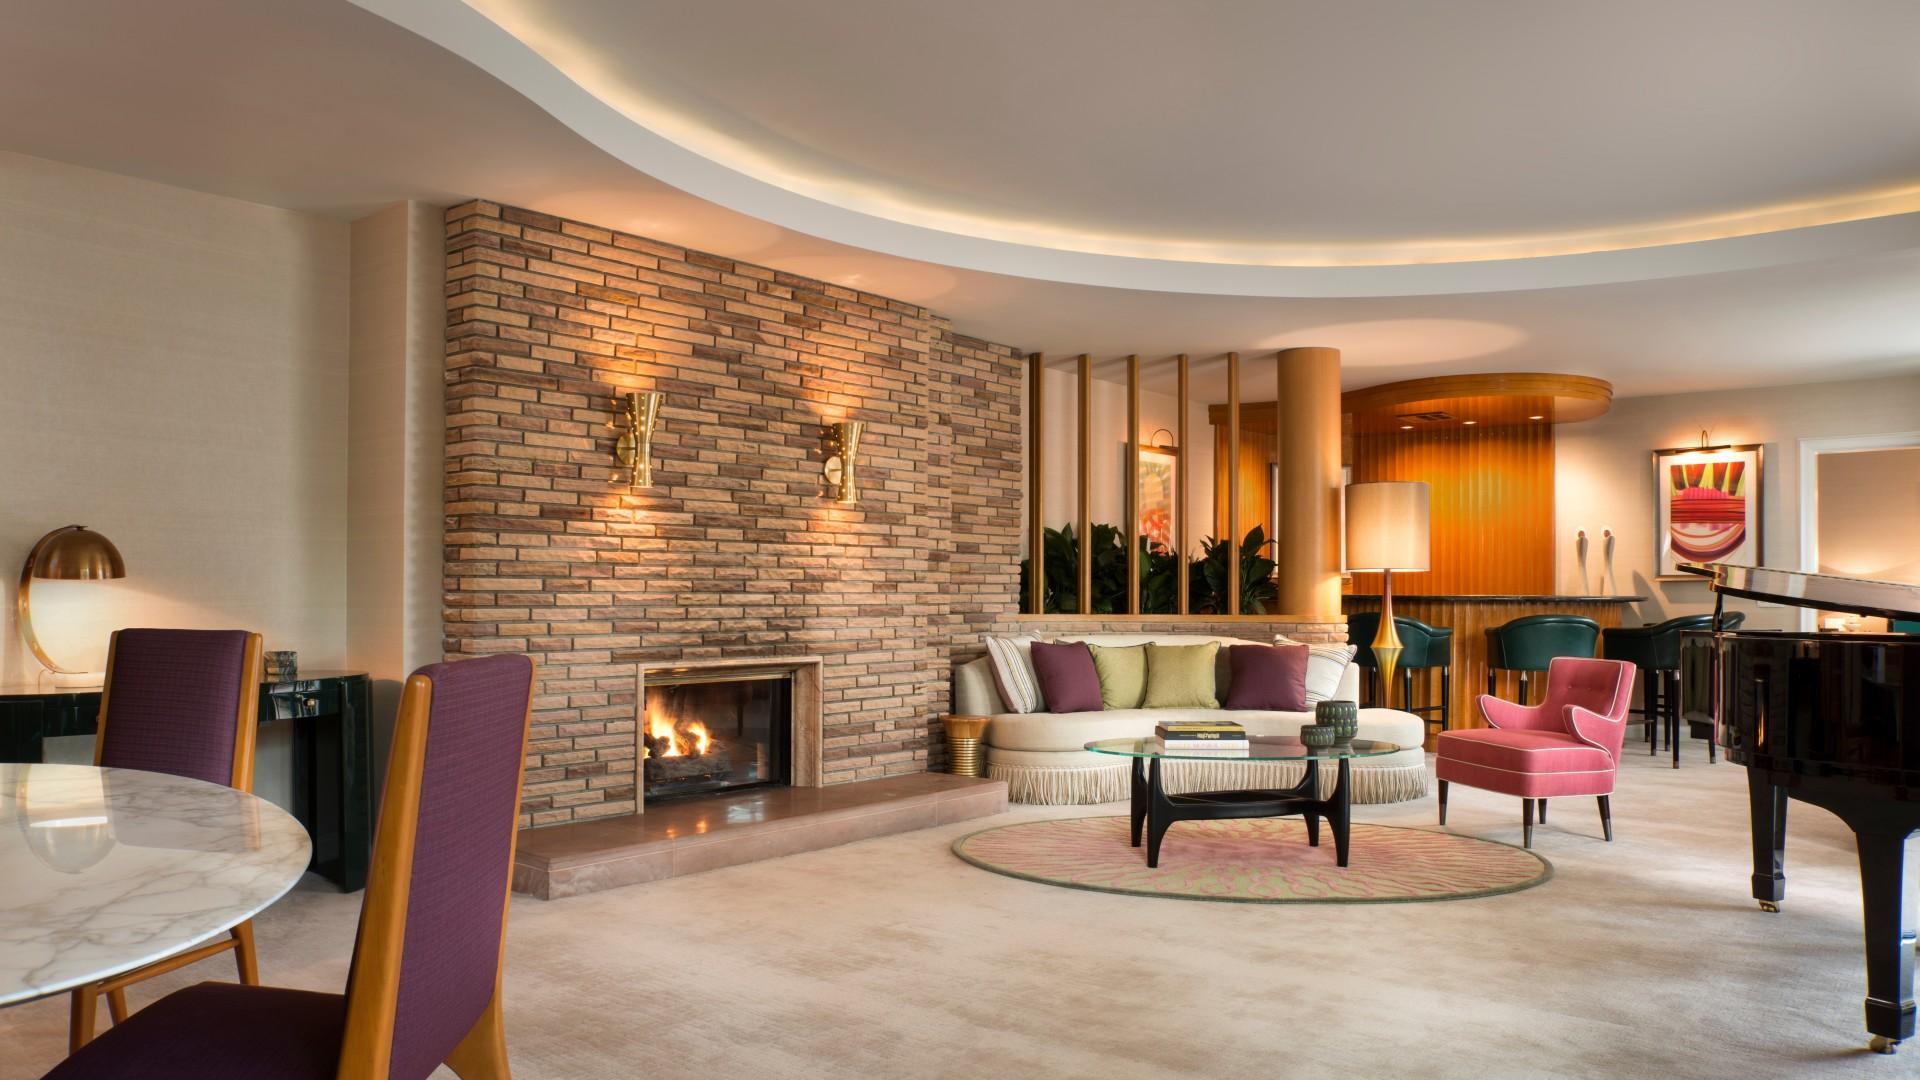 Wallpaper Beverly Hills Hotel, Best hotels of 2015